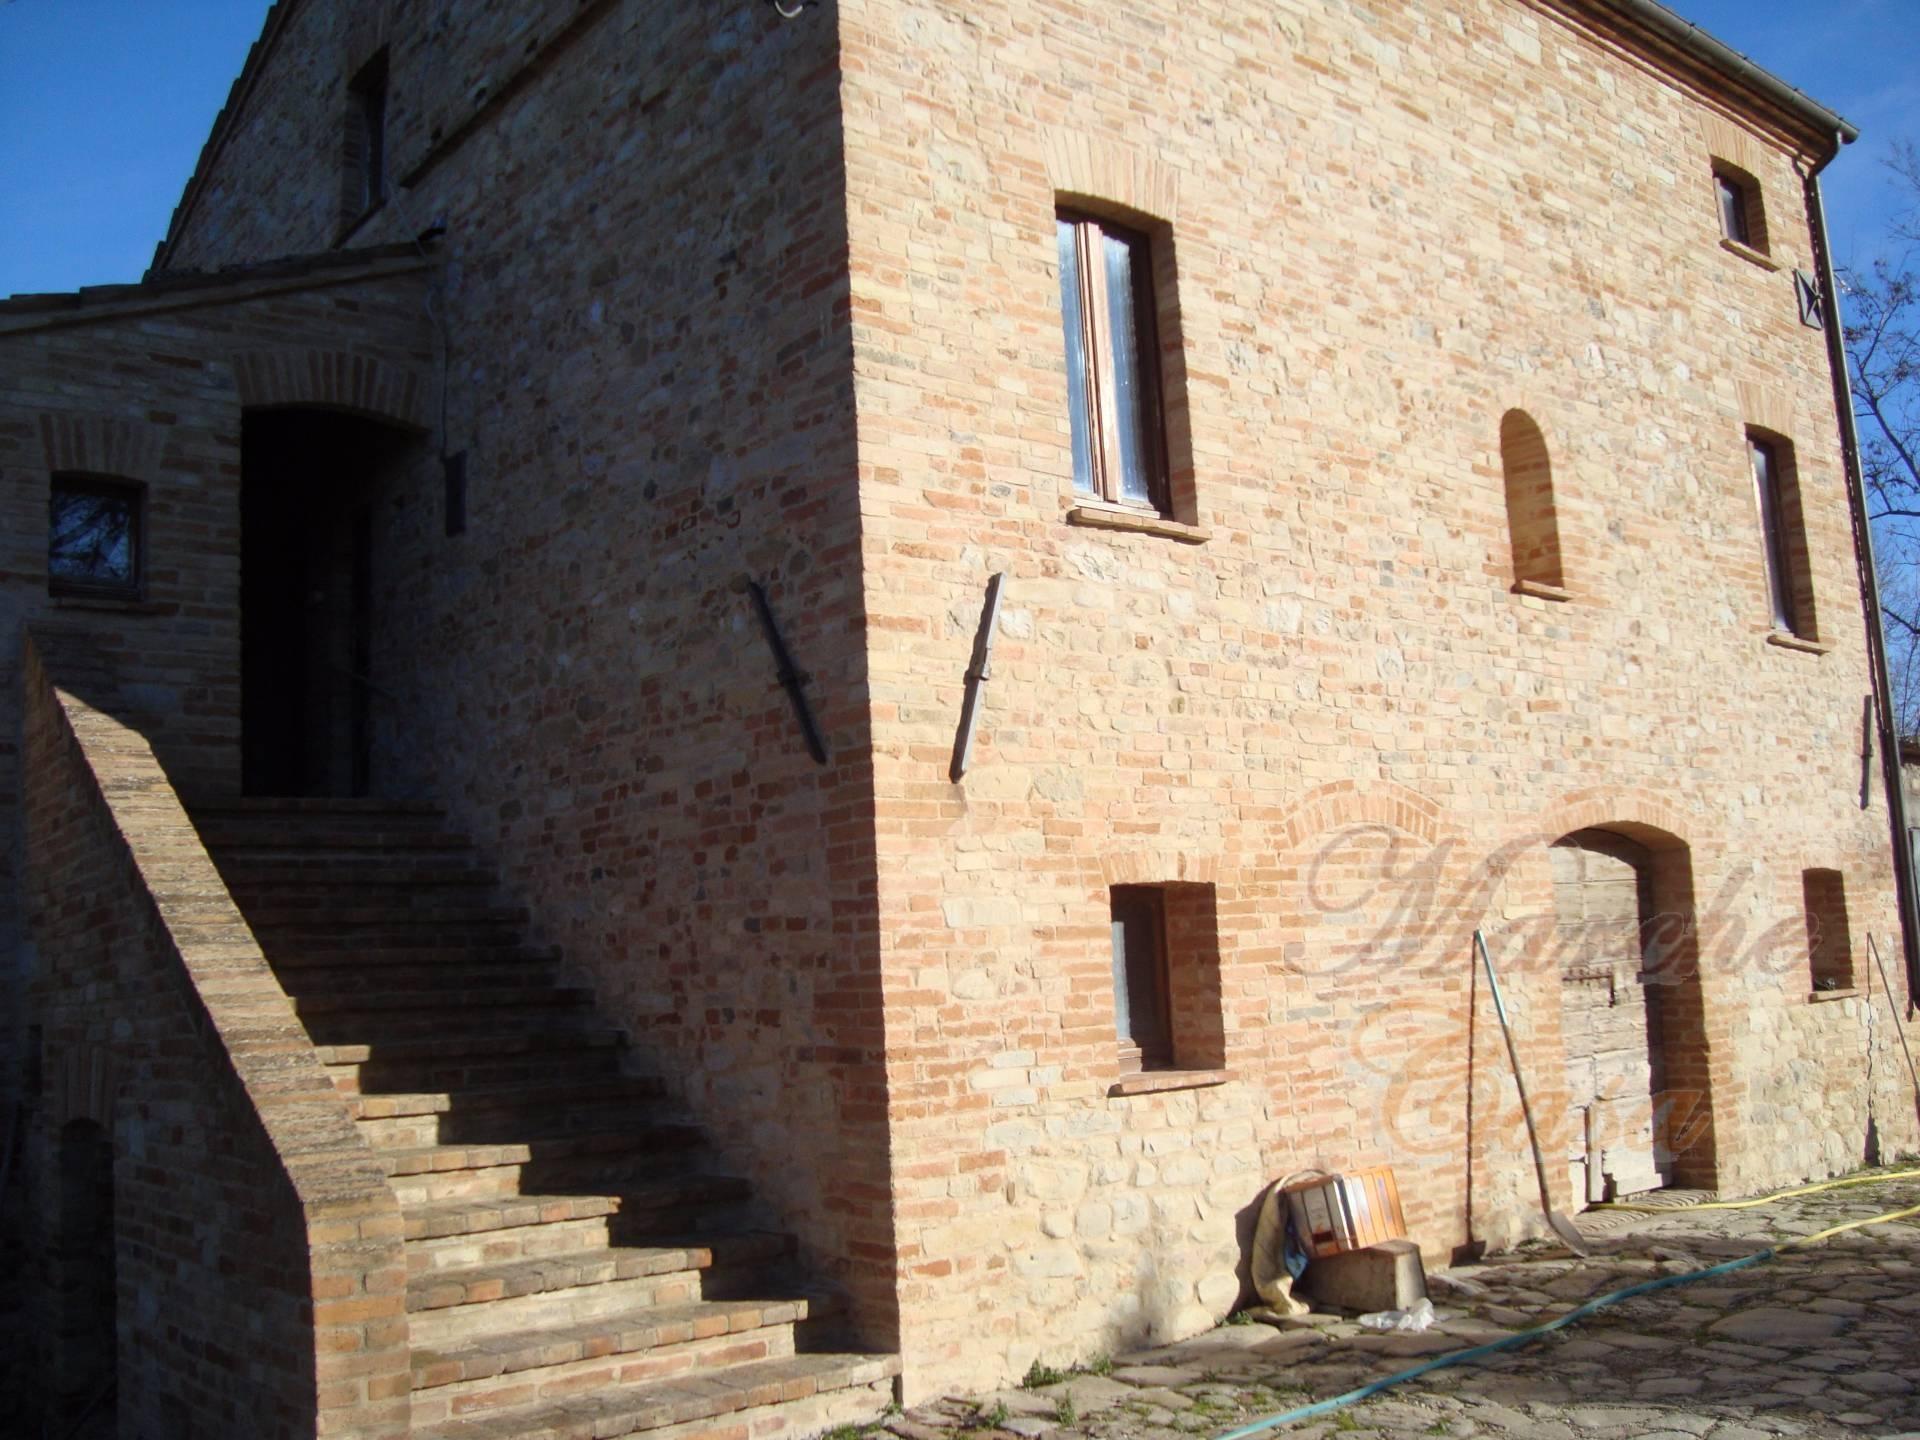 rustico cascina vendita montedinove di metri quadrati 300